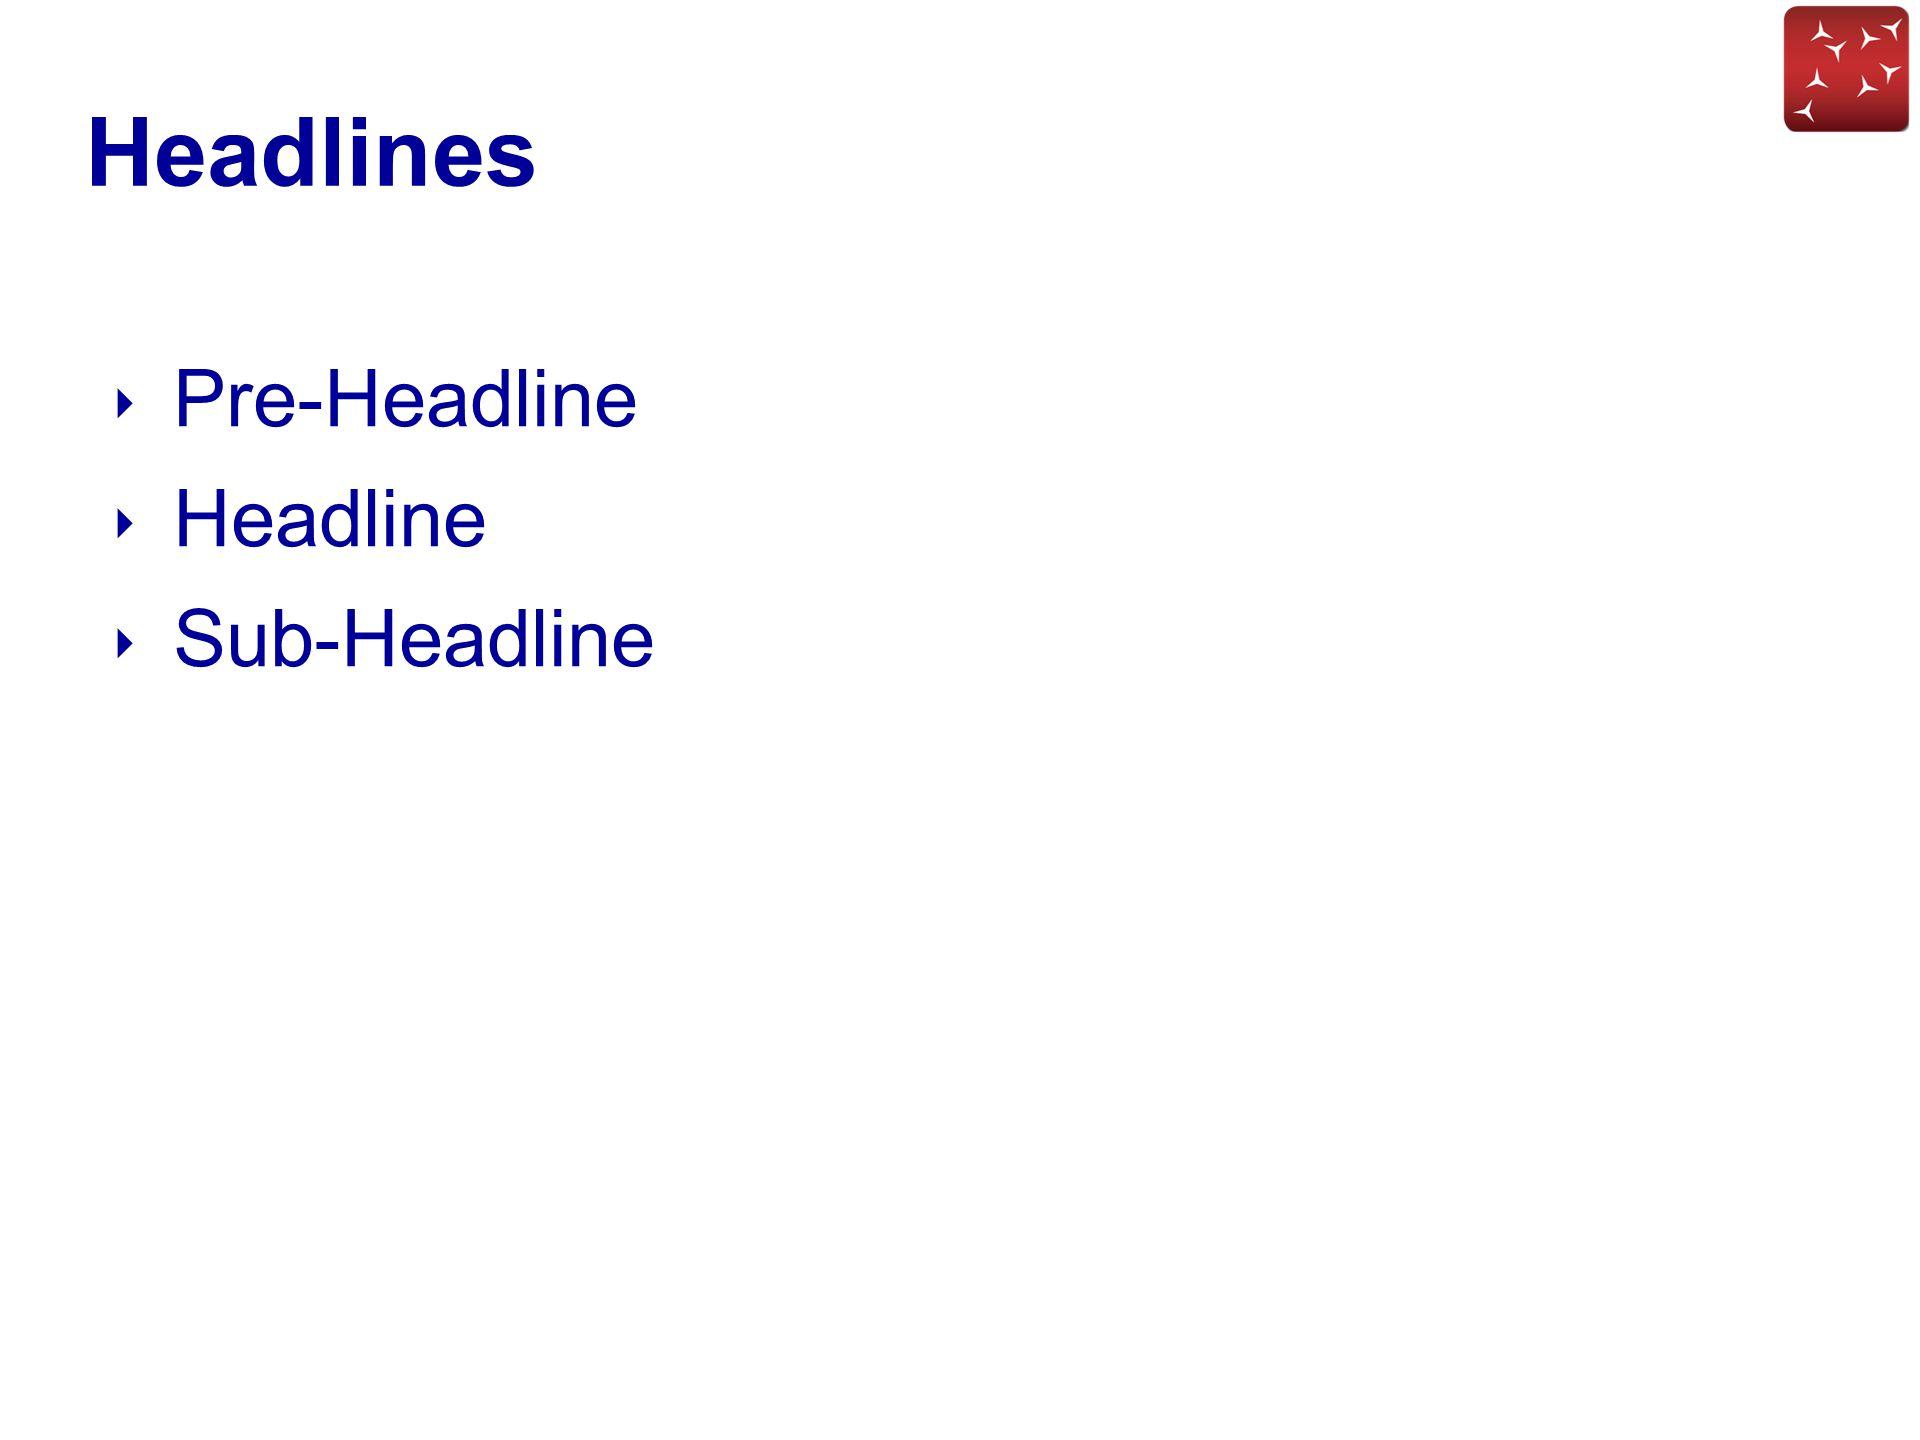 Headlines Pre-Headline Headline Sub-Headline